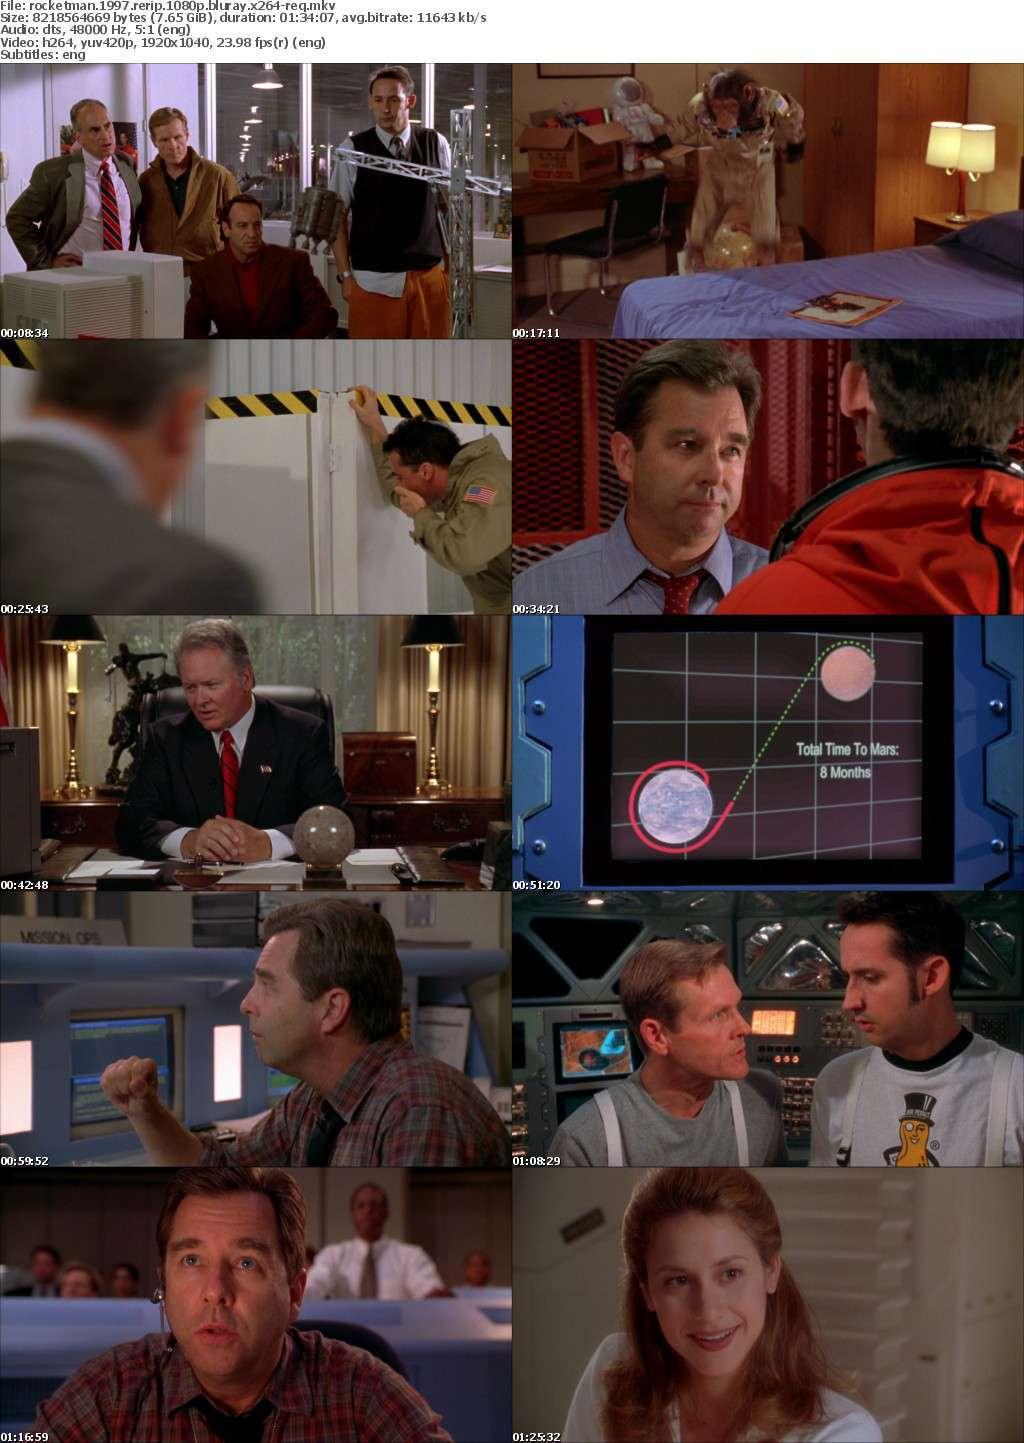 RocketMan 1997 RERIP 1080p BluRay x264-REQ